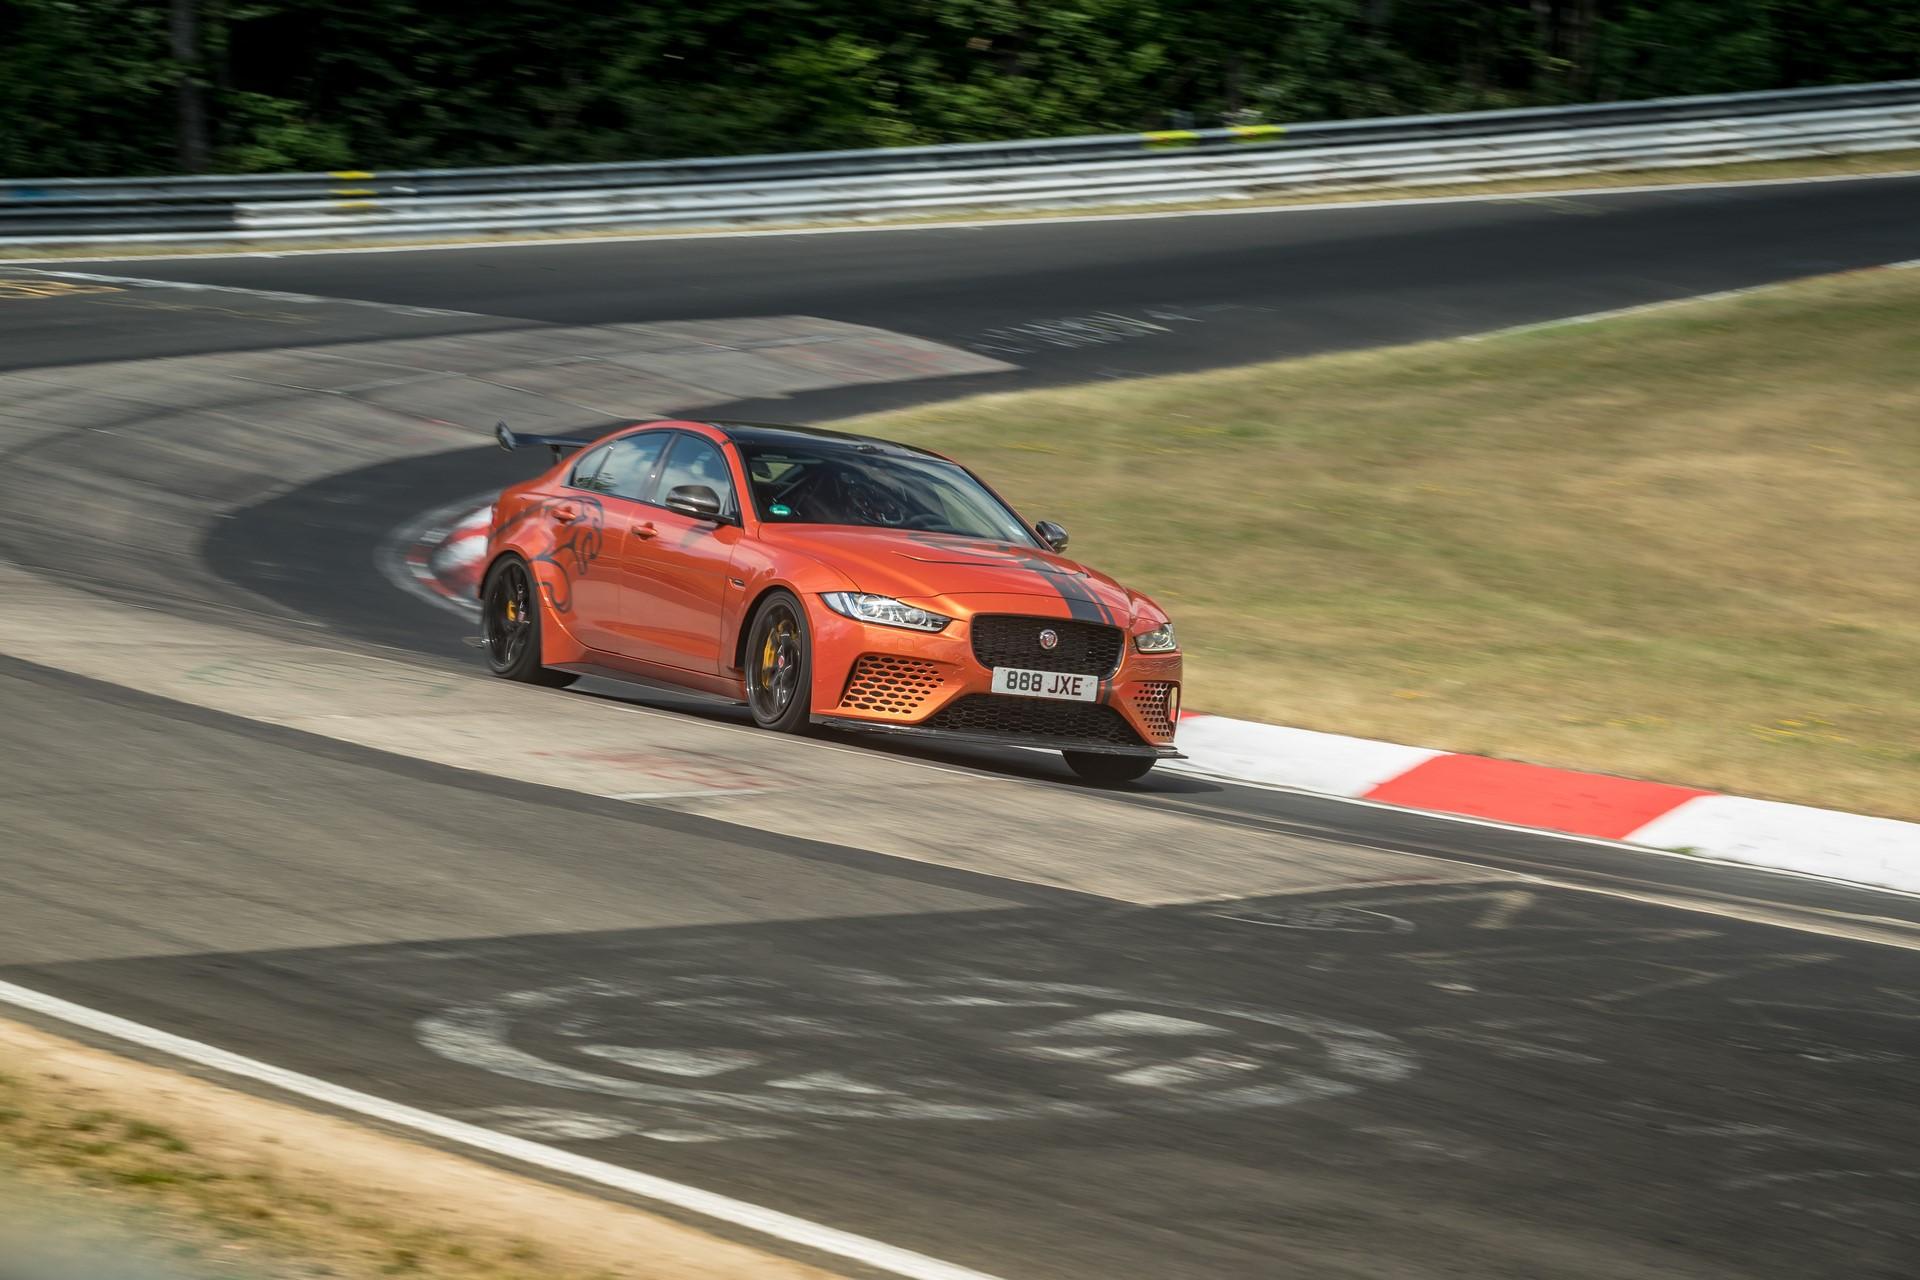 Jaguar-XE-SV-Project-8-new-Nurburgring-record-4